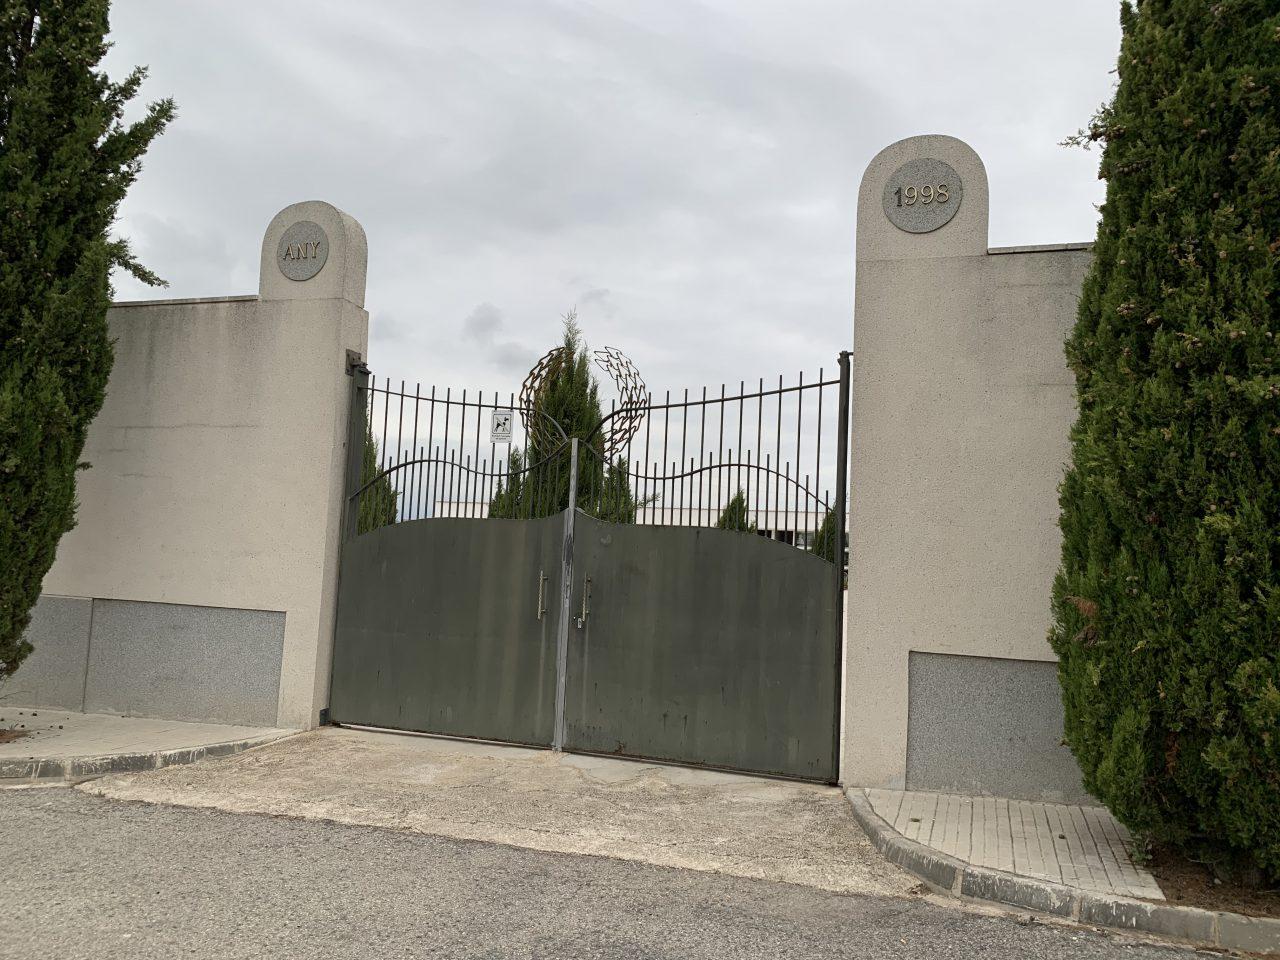 cementiri-municipal-1280x960.jpeg